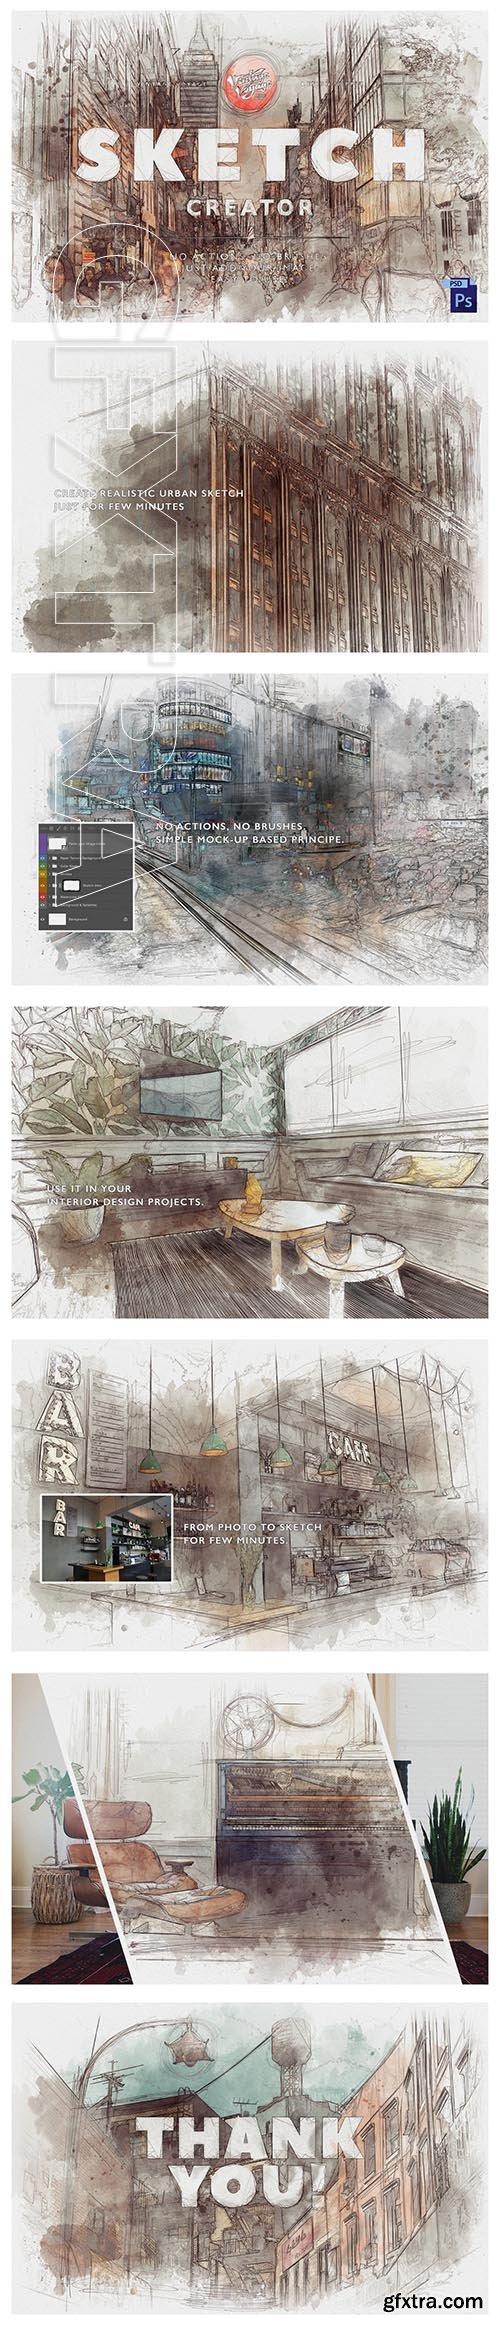 CreativeMarket - VVDS Sketch Creator 4021313